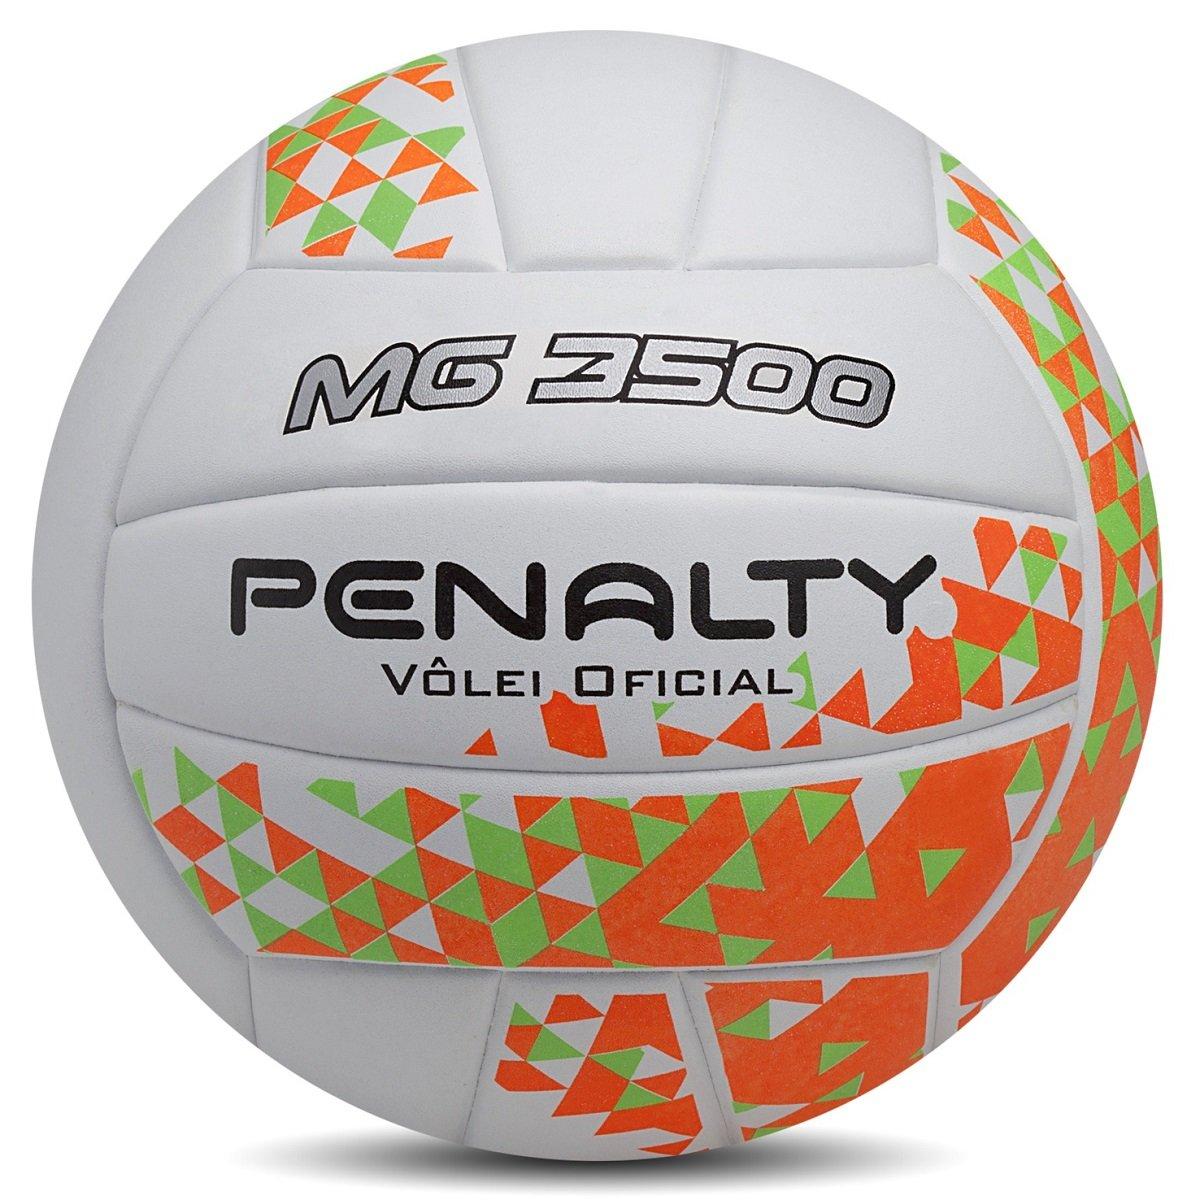 Bola Vôlei Penalty MG 3500 VIII 520315 1790 f9b833eb92bcf